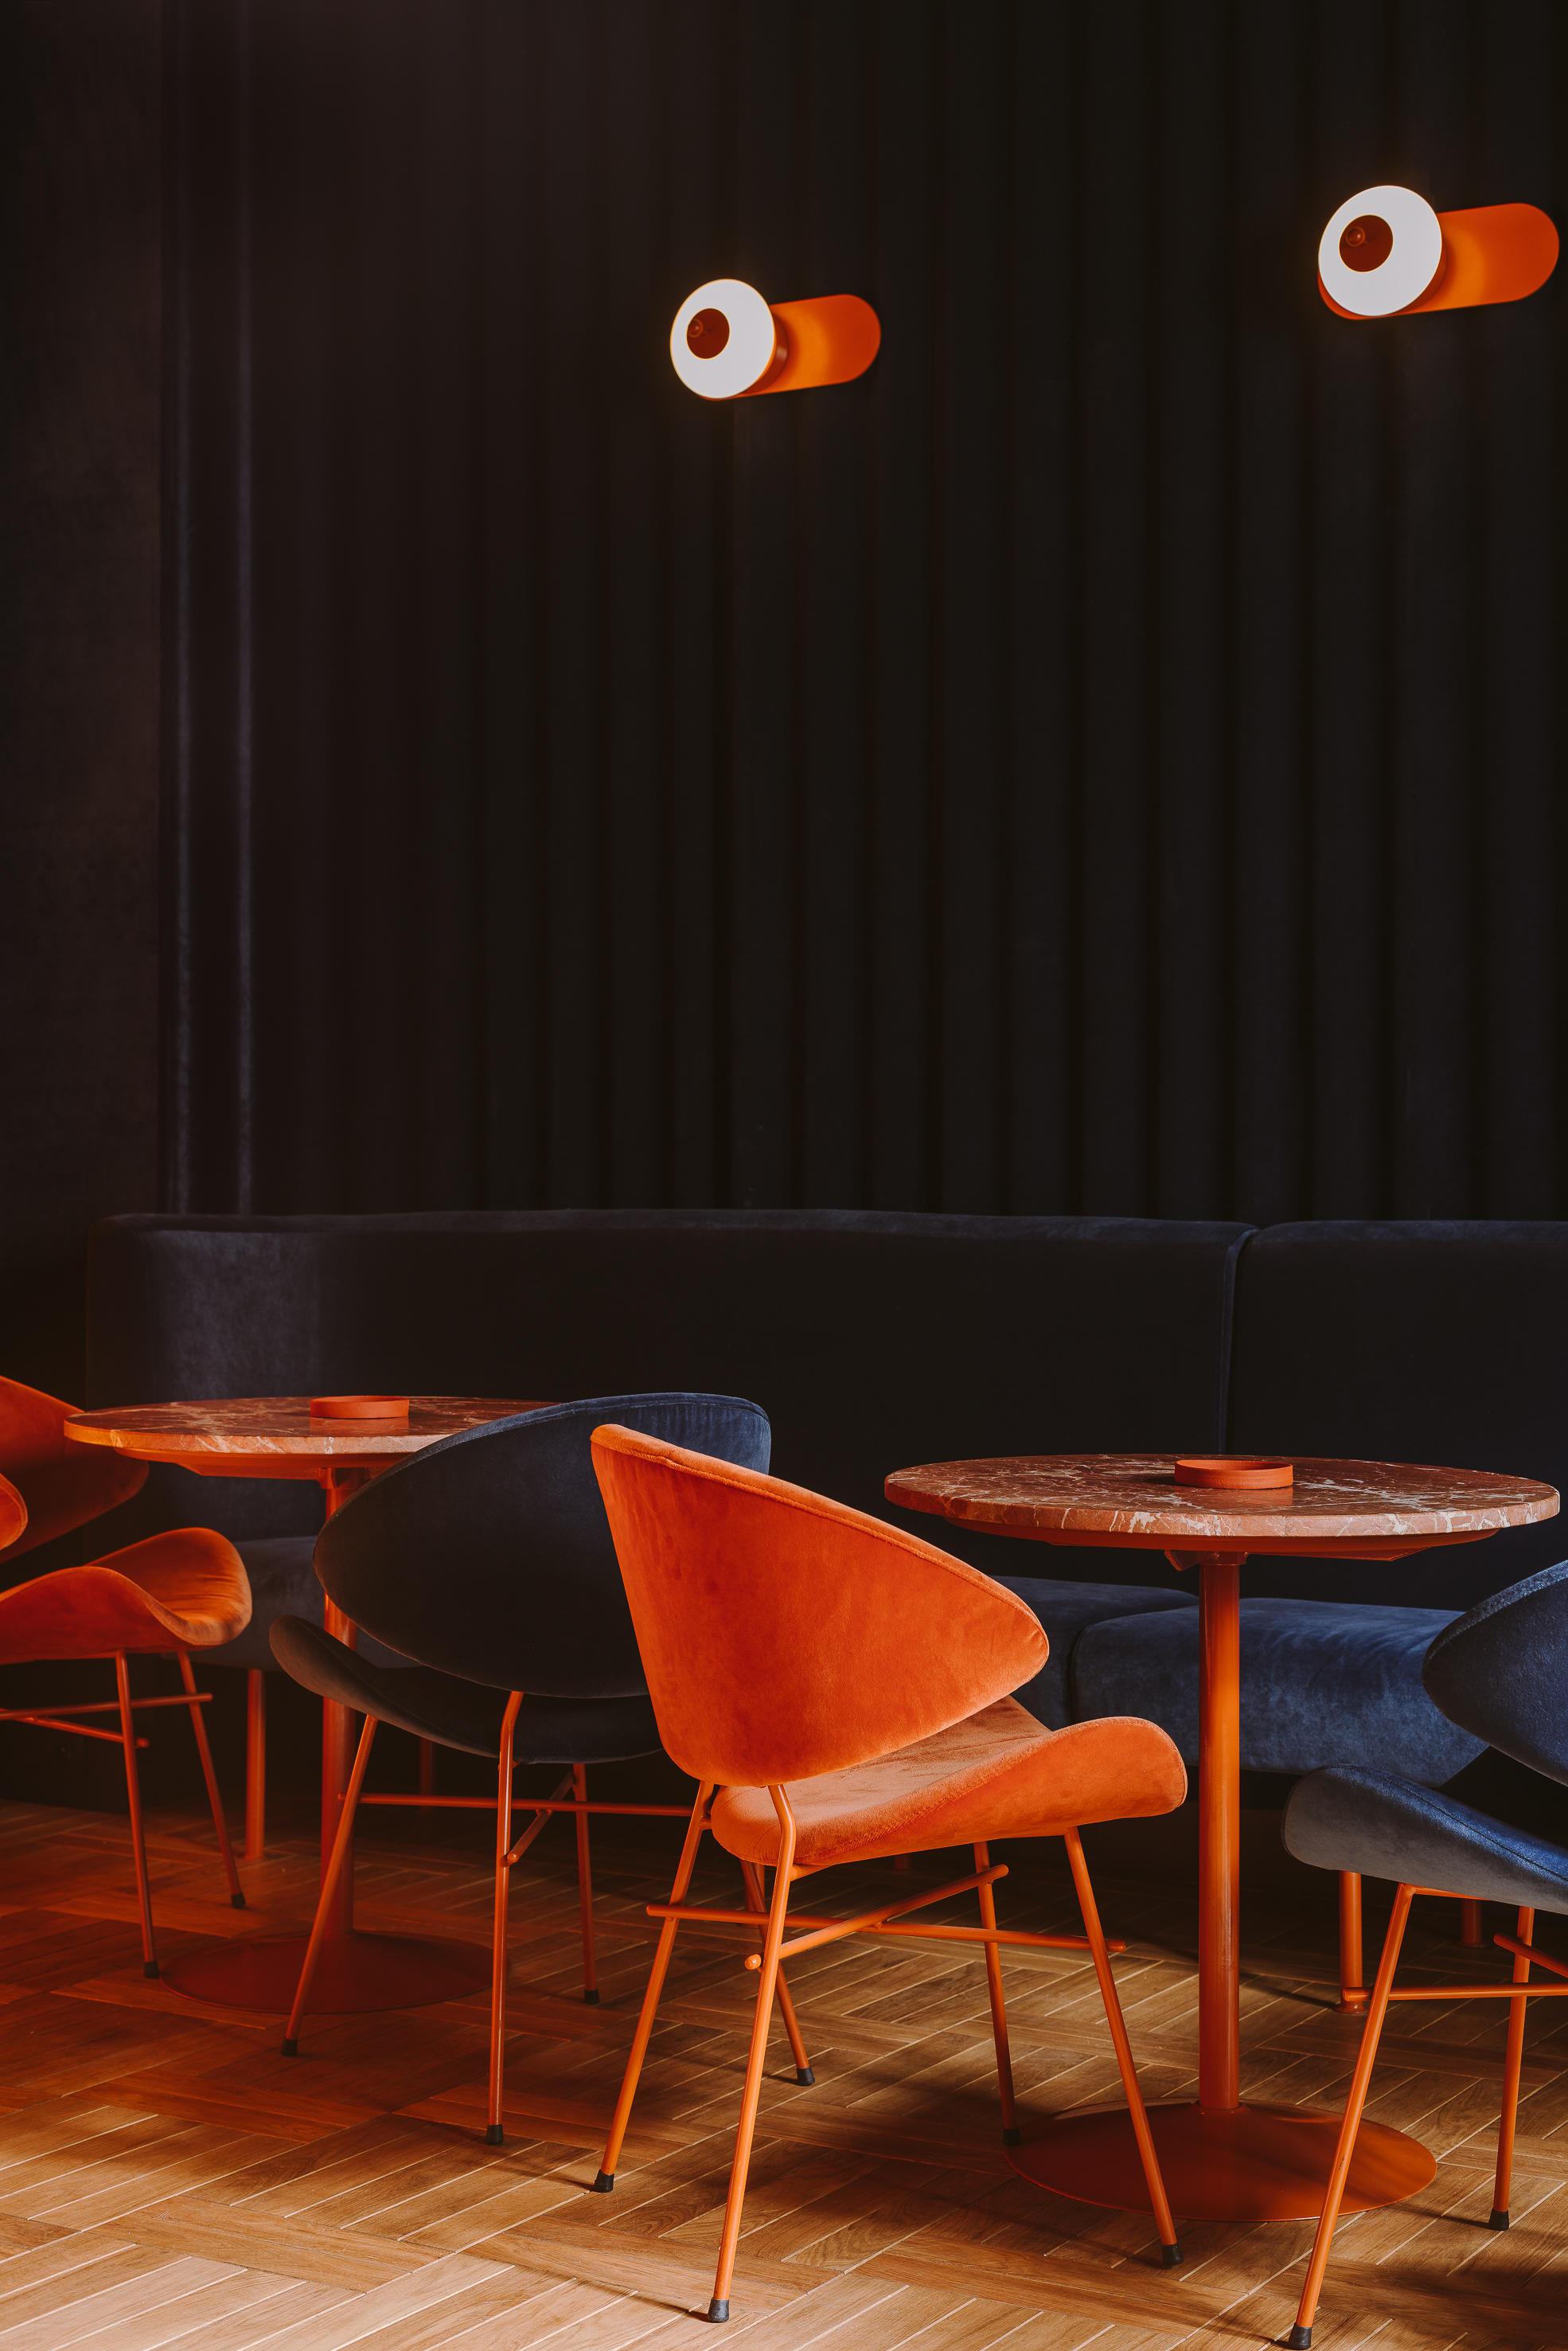 buck-studio-opasly-tom-restaurant-architonicbuckstudio-opasly-tom-14-20-arcit18.jpeg